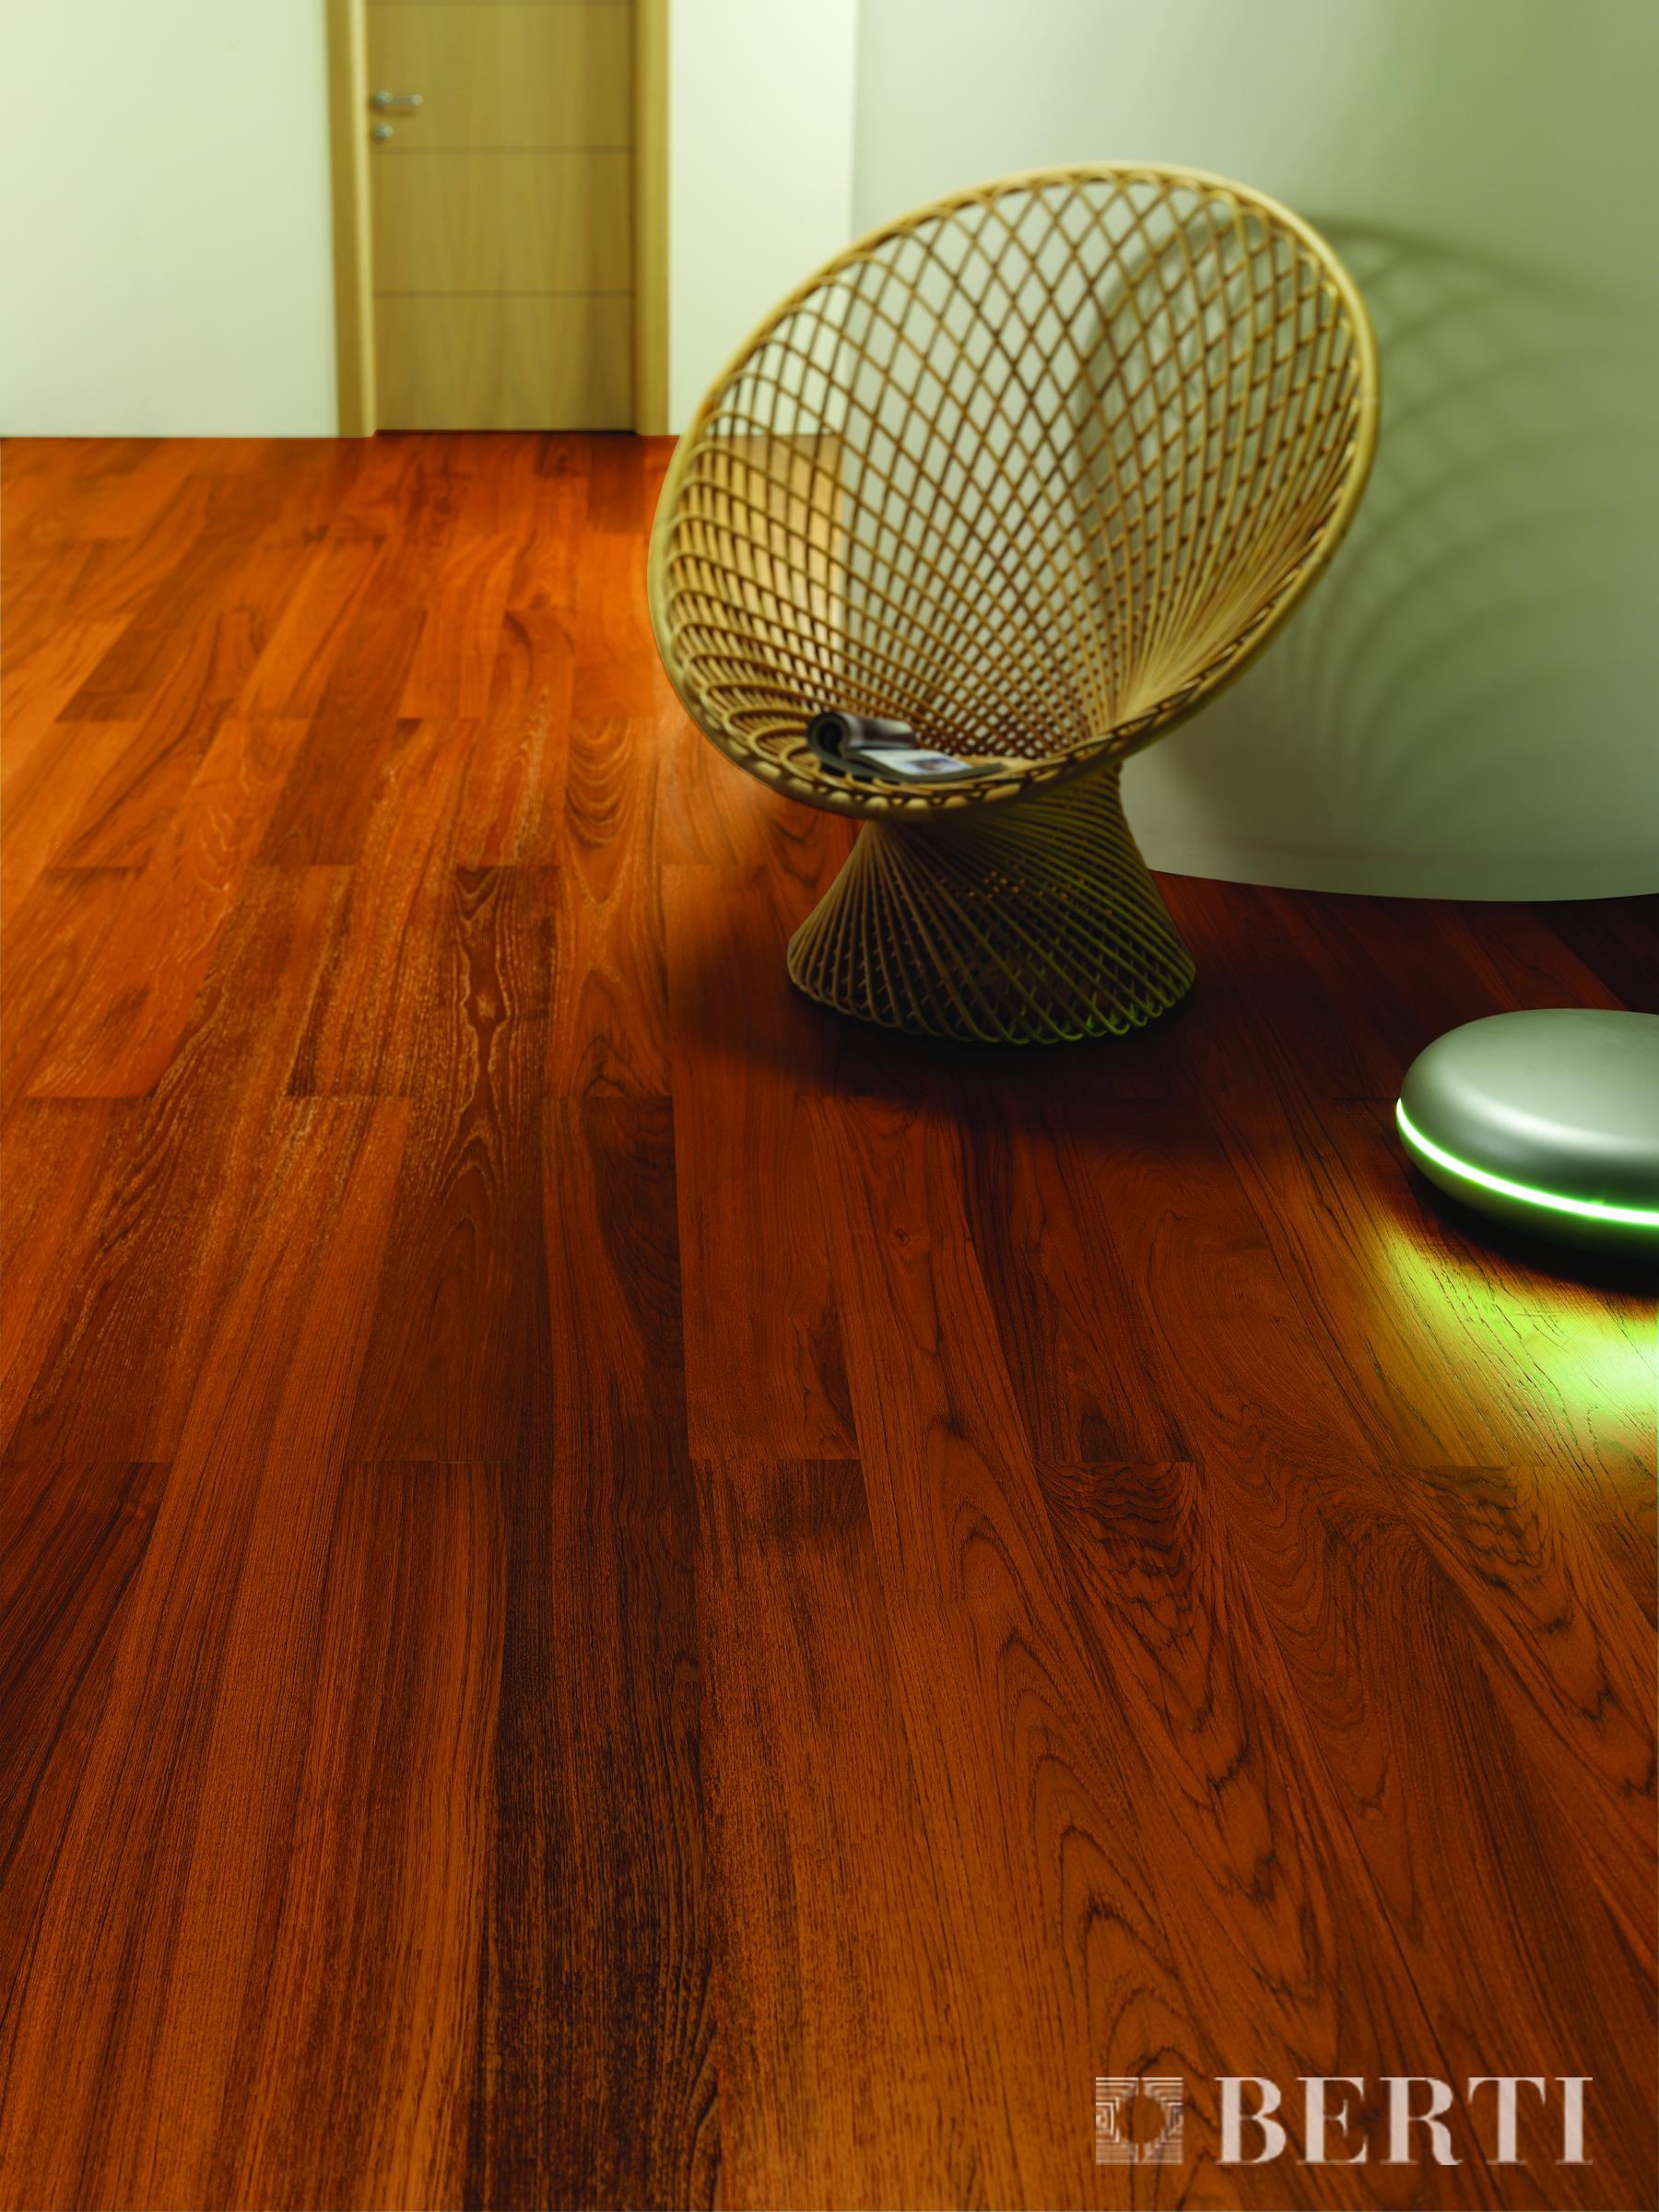 Berti pavimenti legno - parquet teak